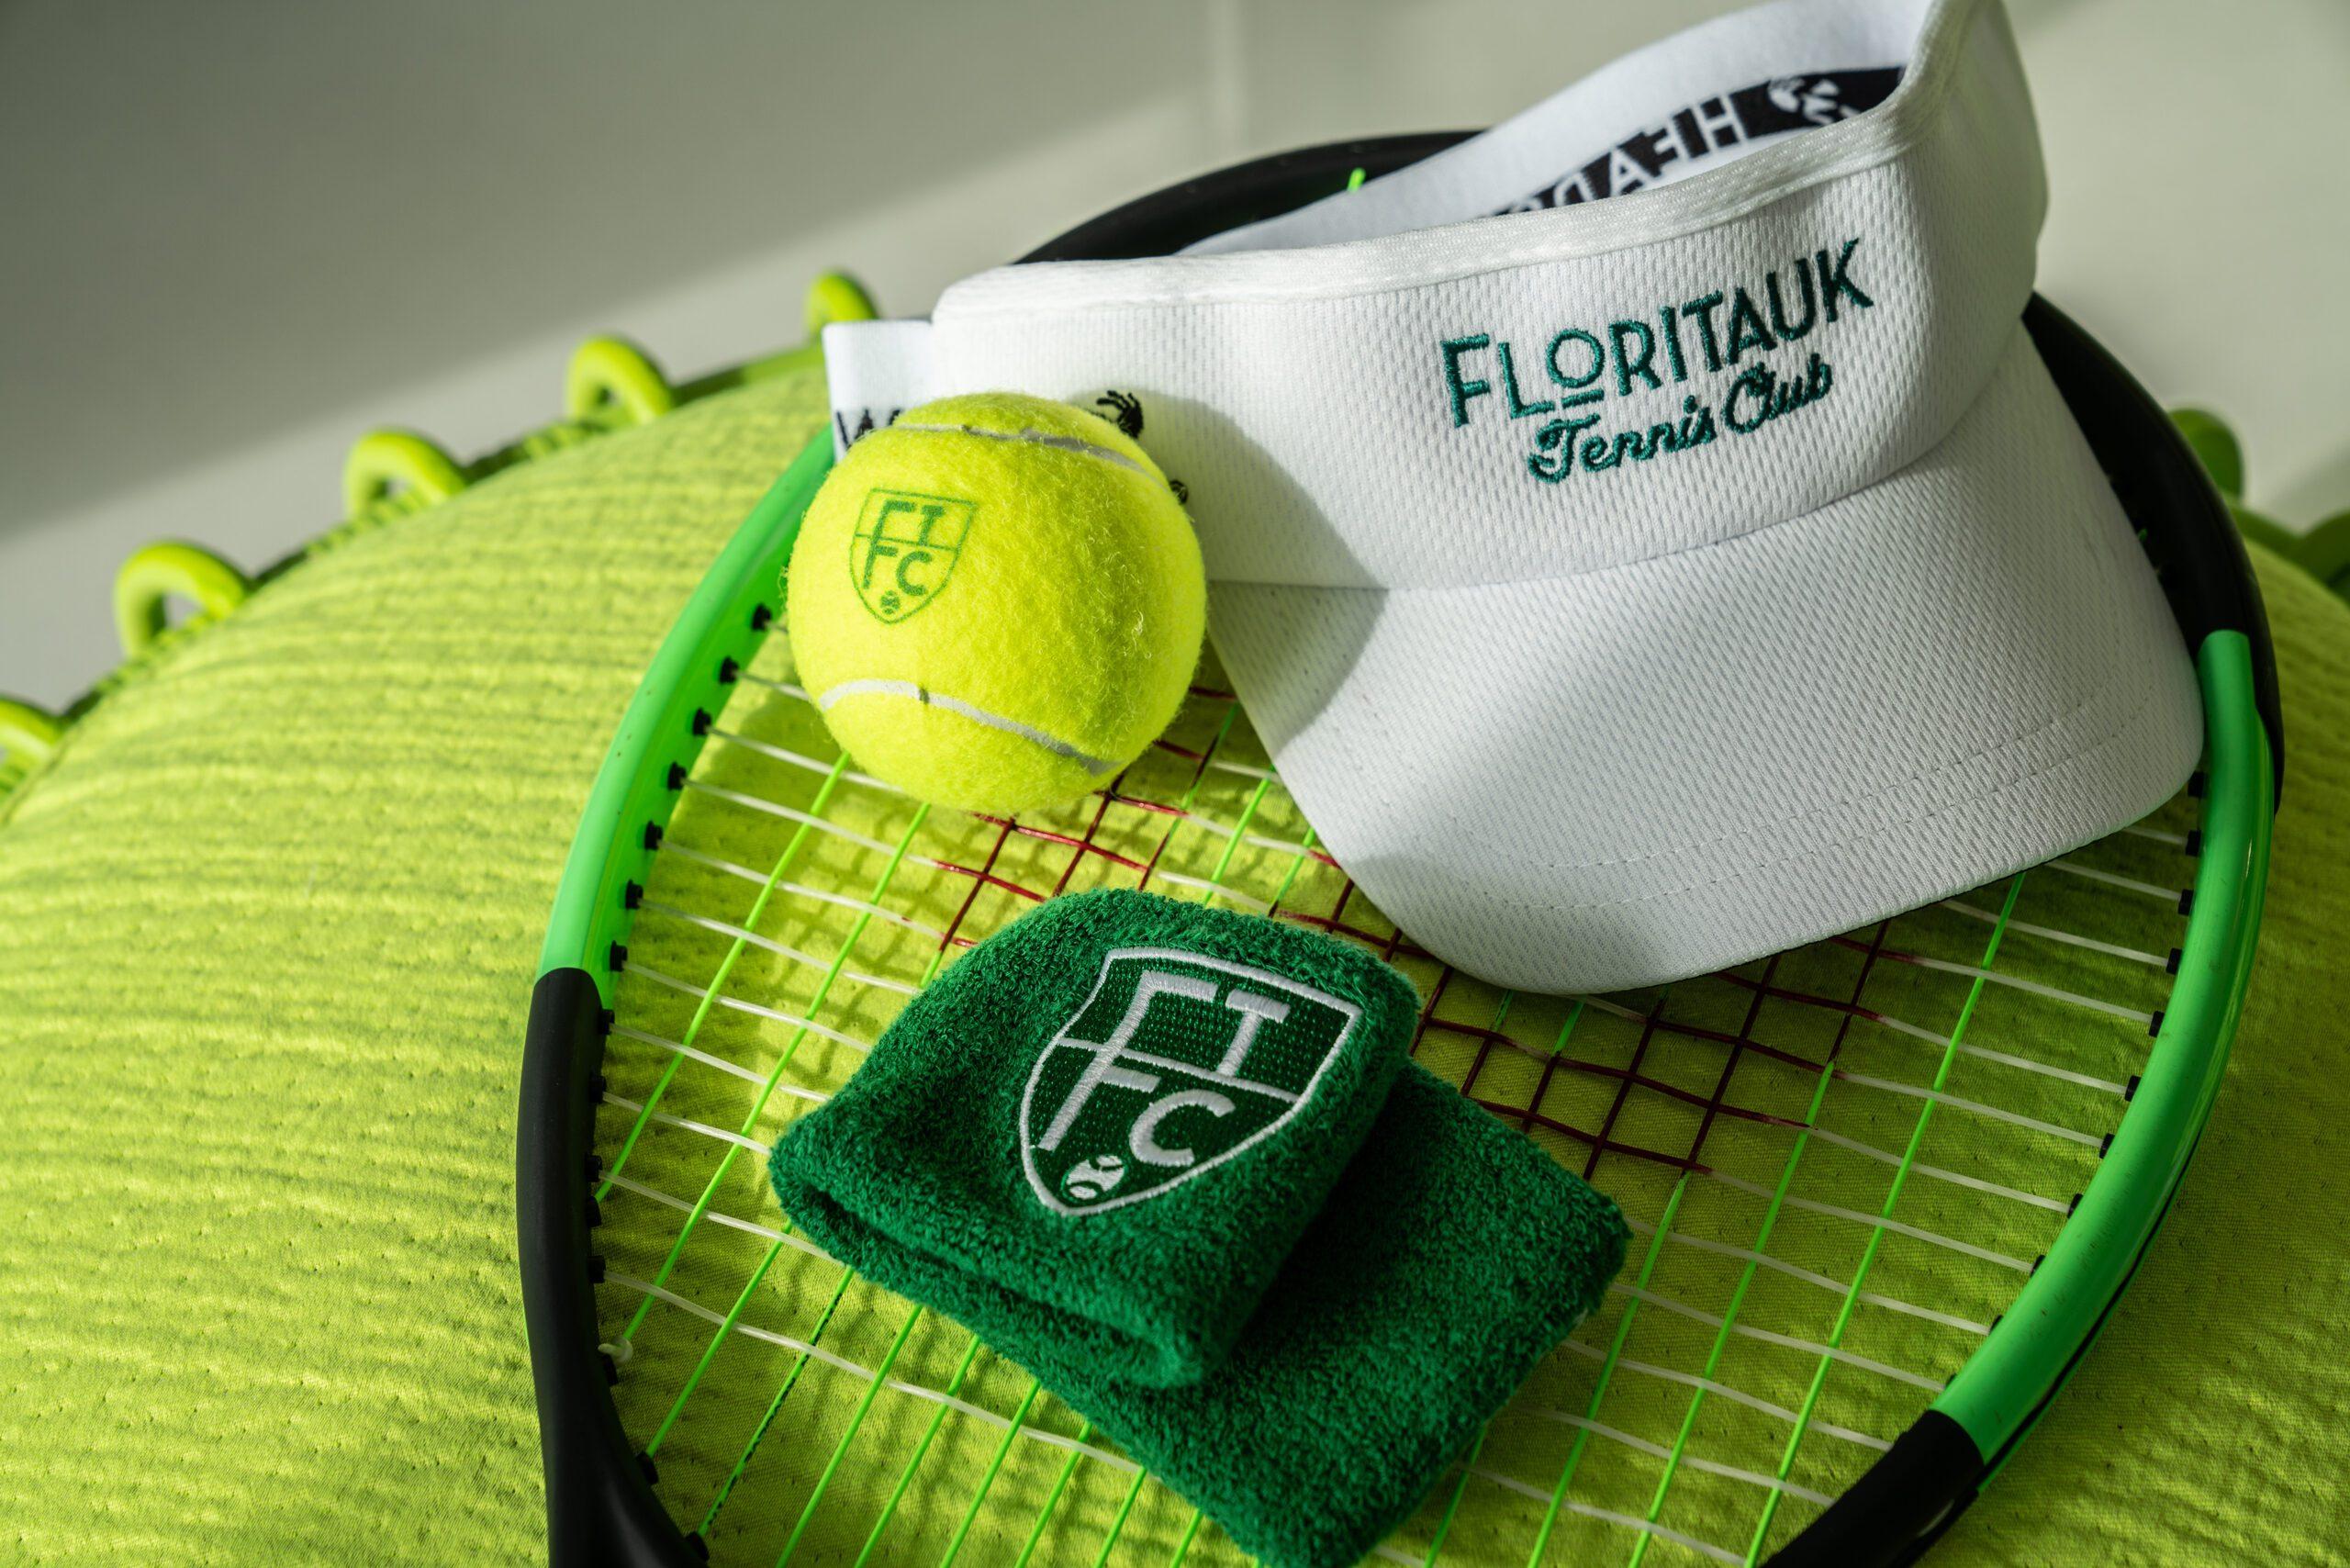 The Floritauk Tennis Club